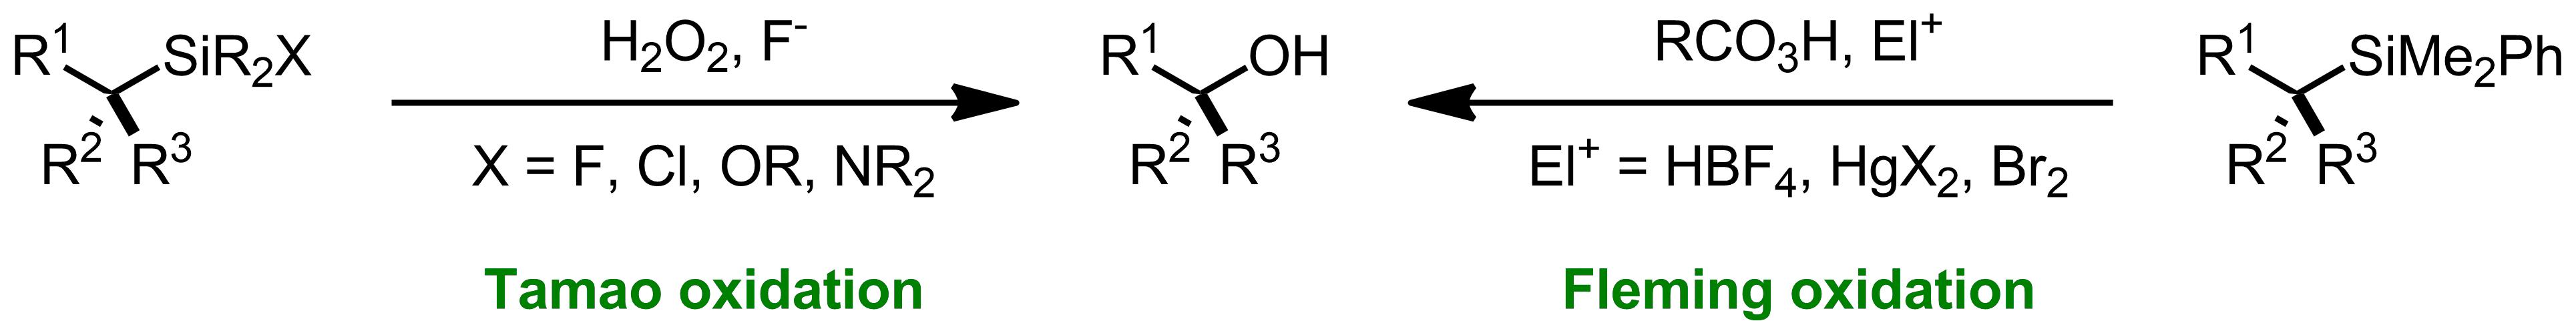 Schematic representation of the Fleming-Tamao Oxidation.